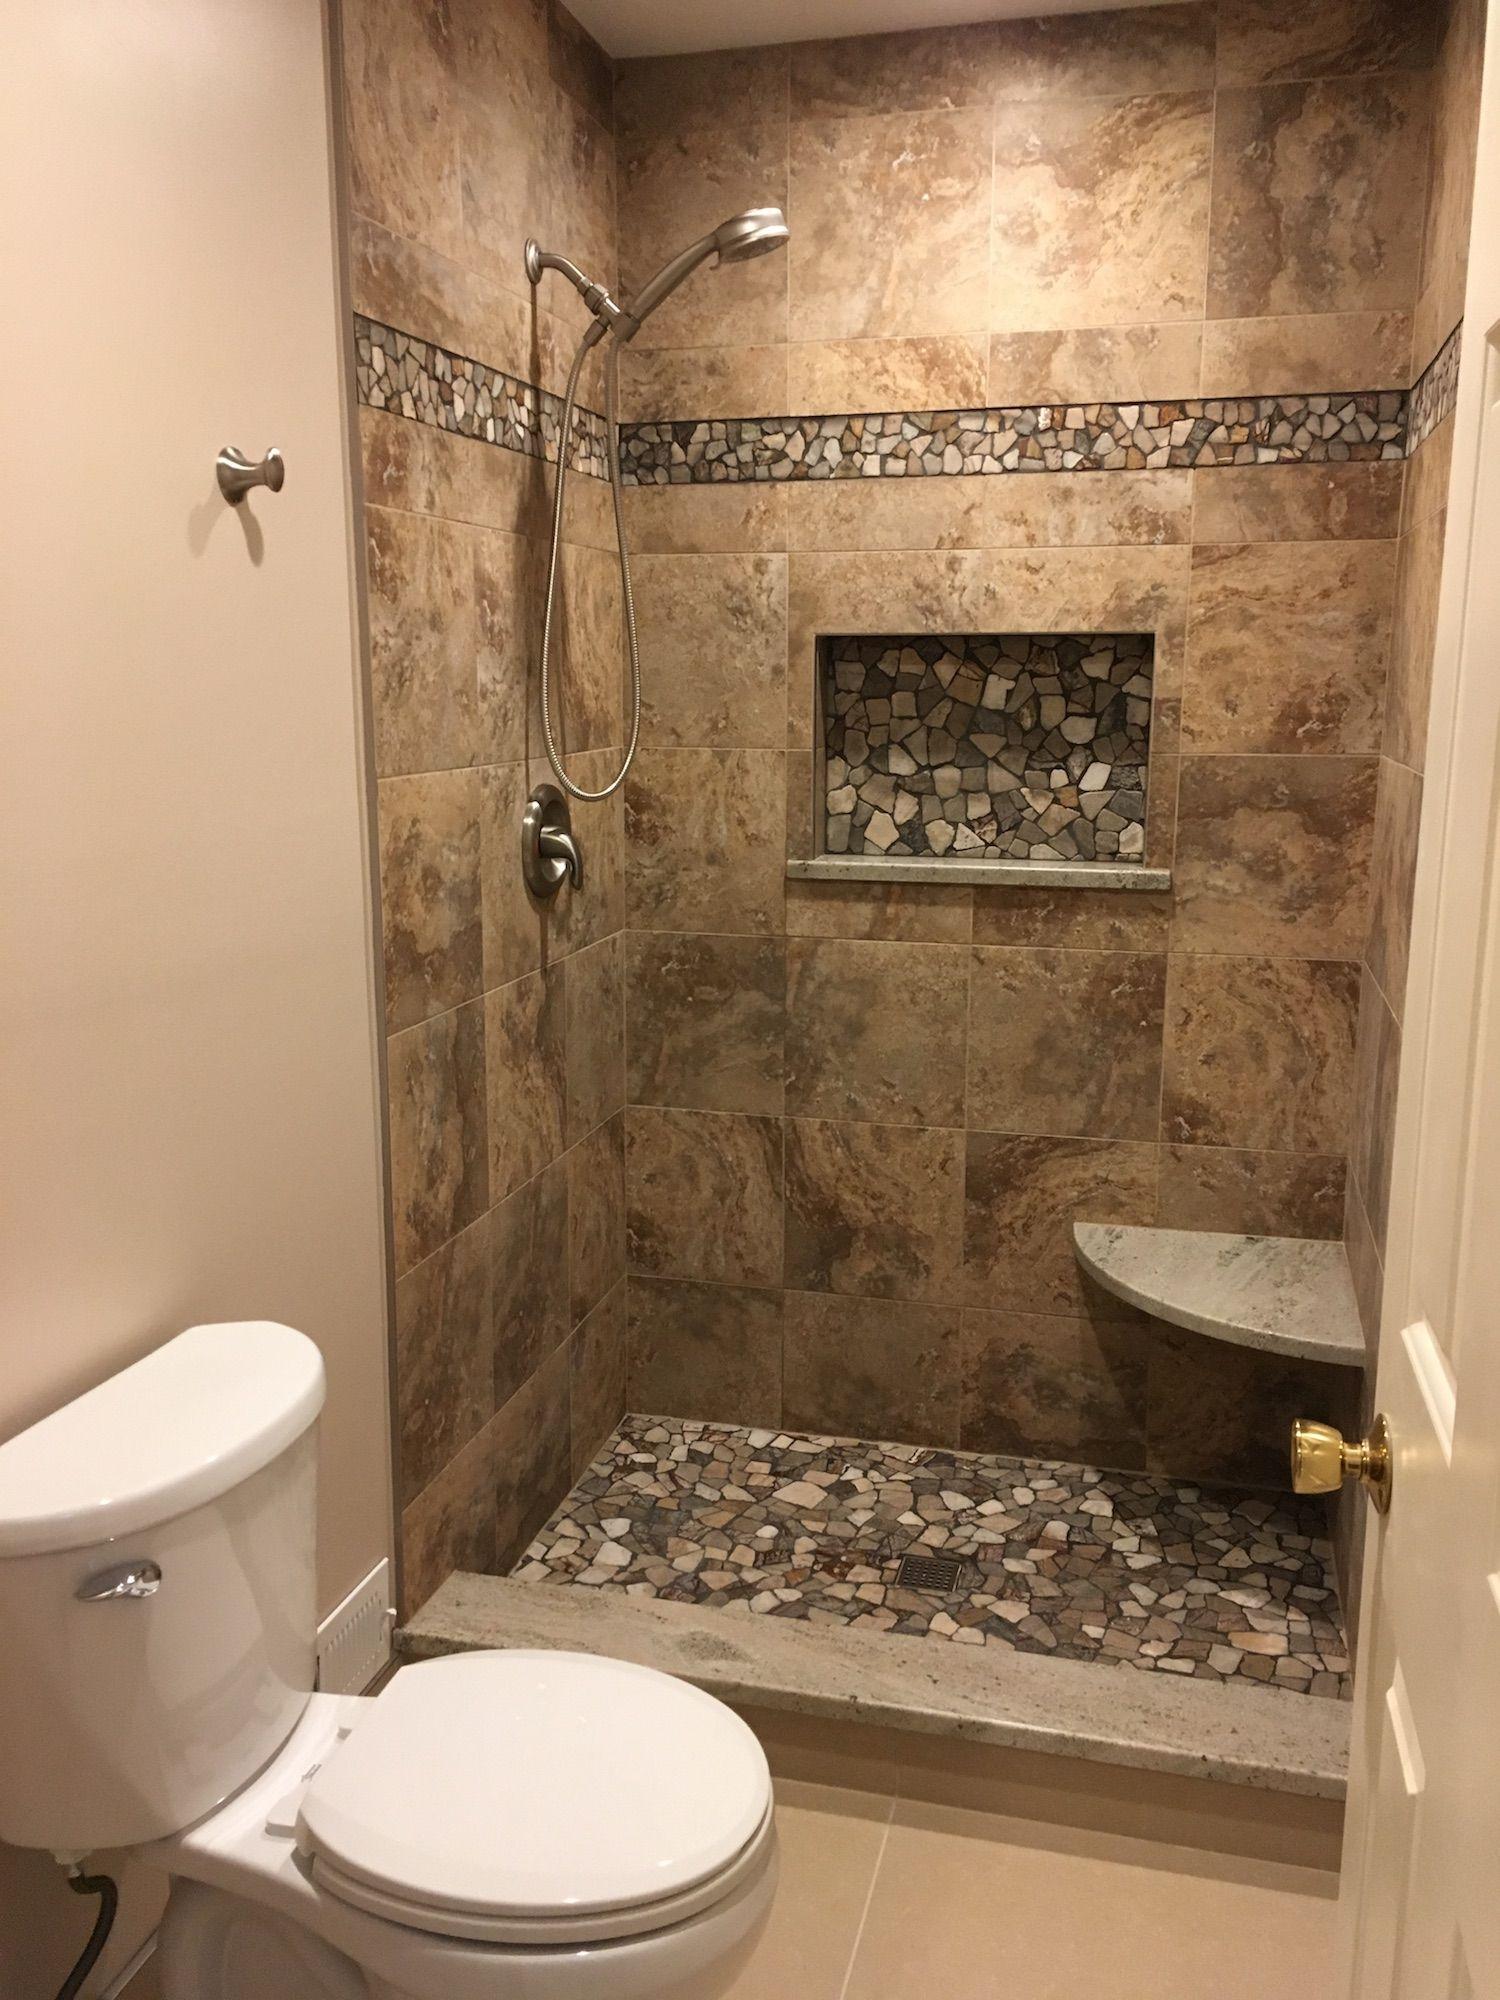 Designer Cabinets, Granite & Tile of Northeast Ohio | Clevelend Cabinates